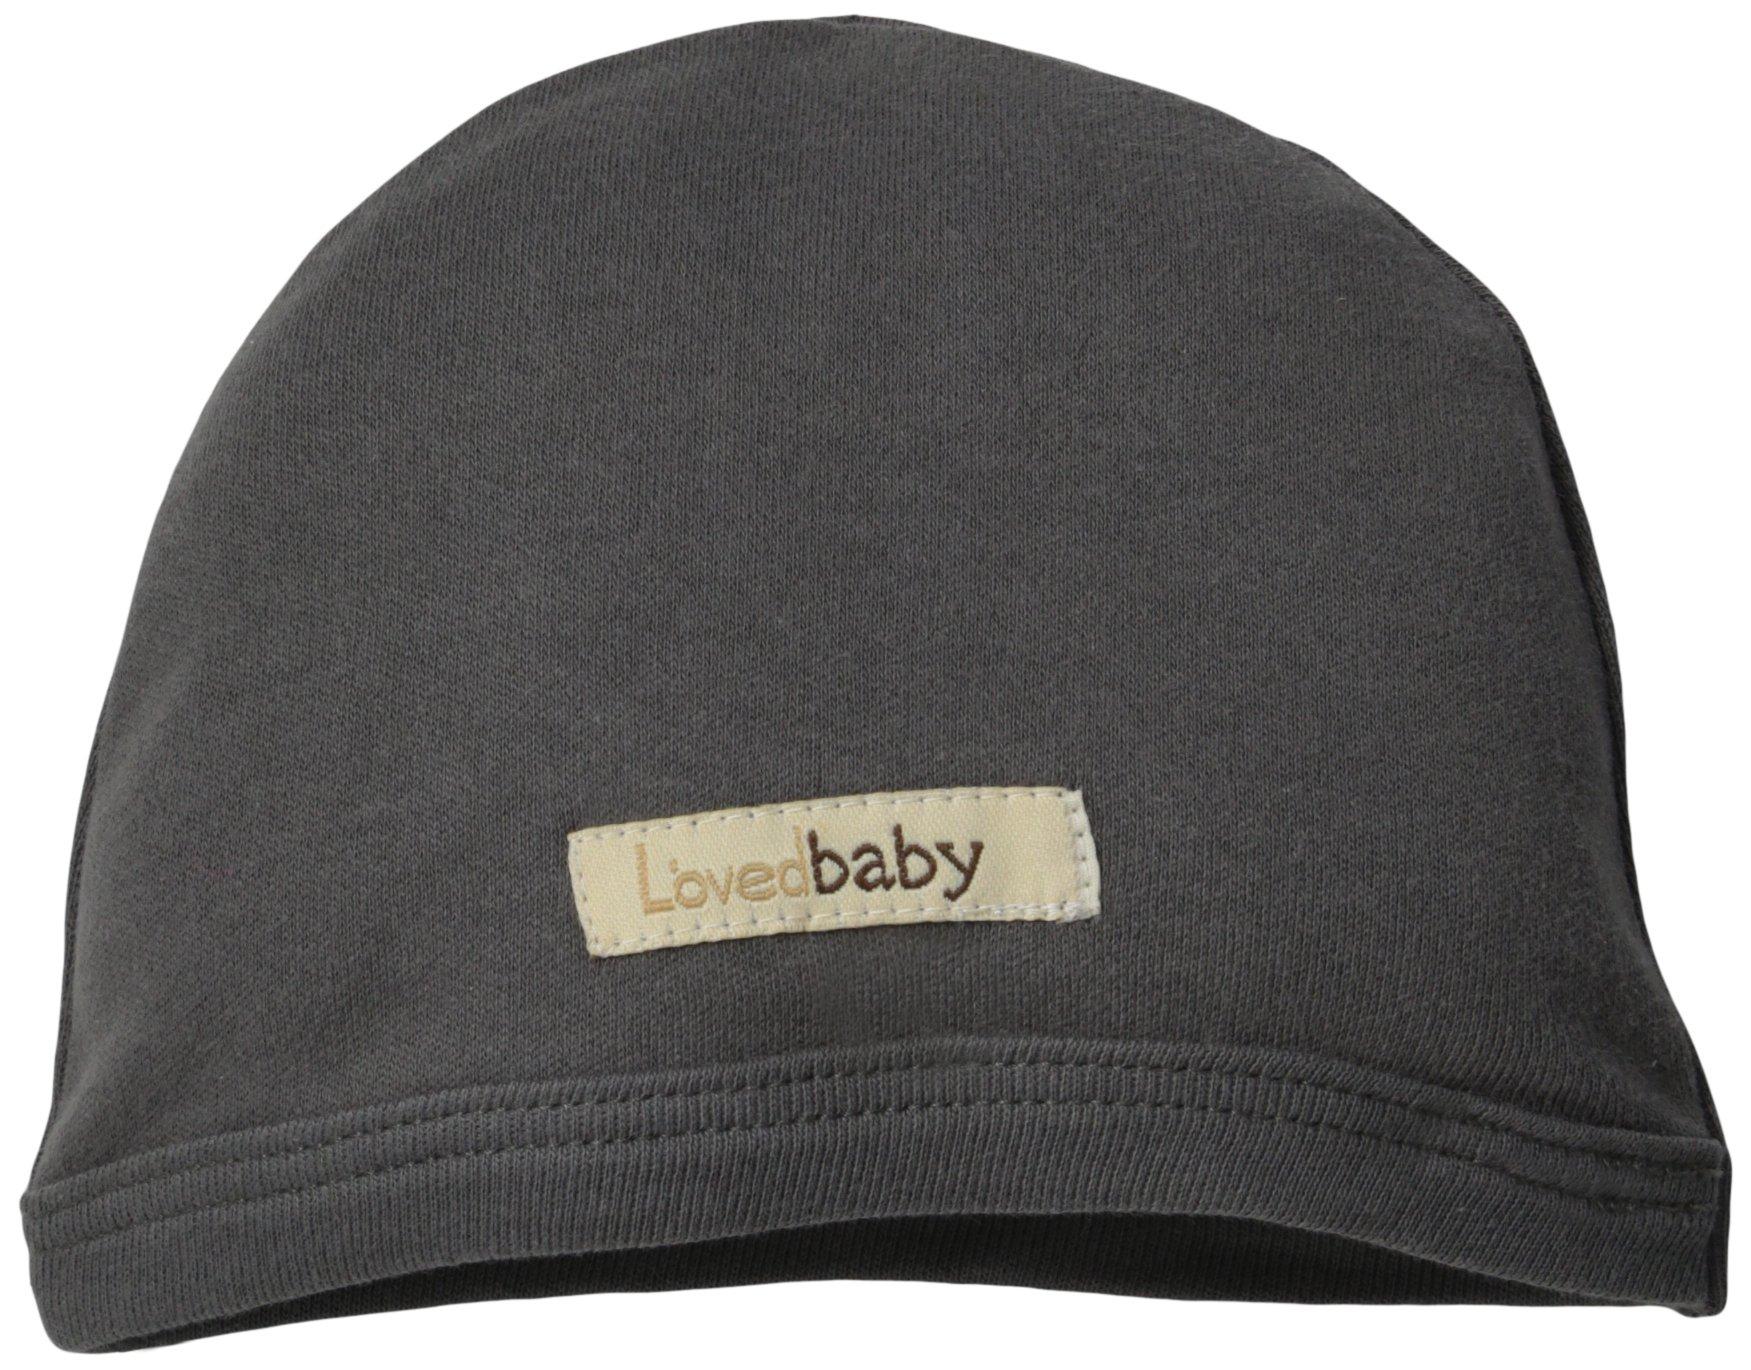 L'ovedbaby Unisex-Baby Newborn Organic Cute Cap, Gray, 12/24 Months